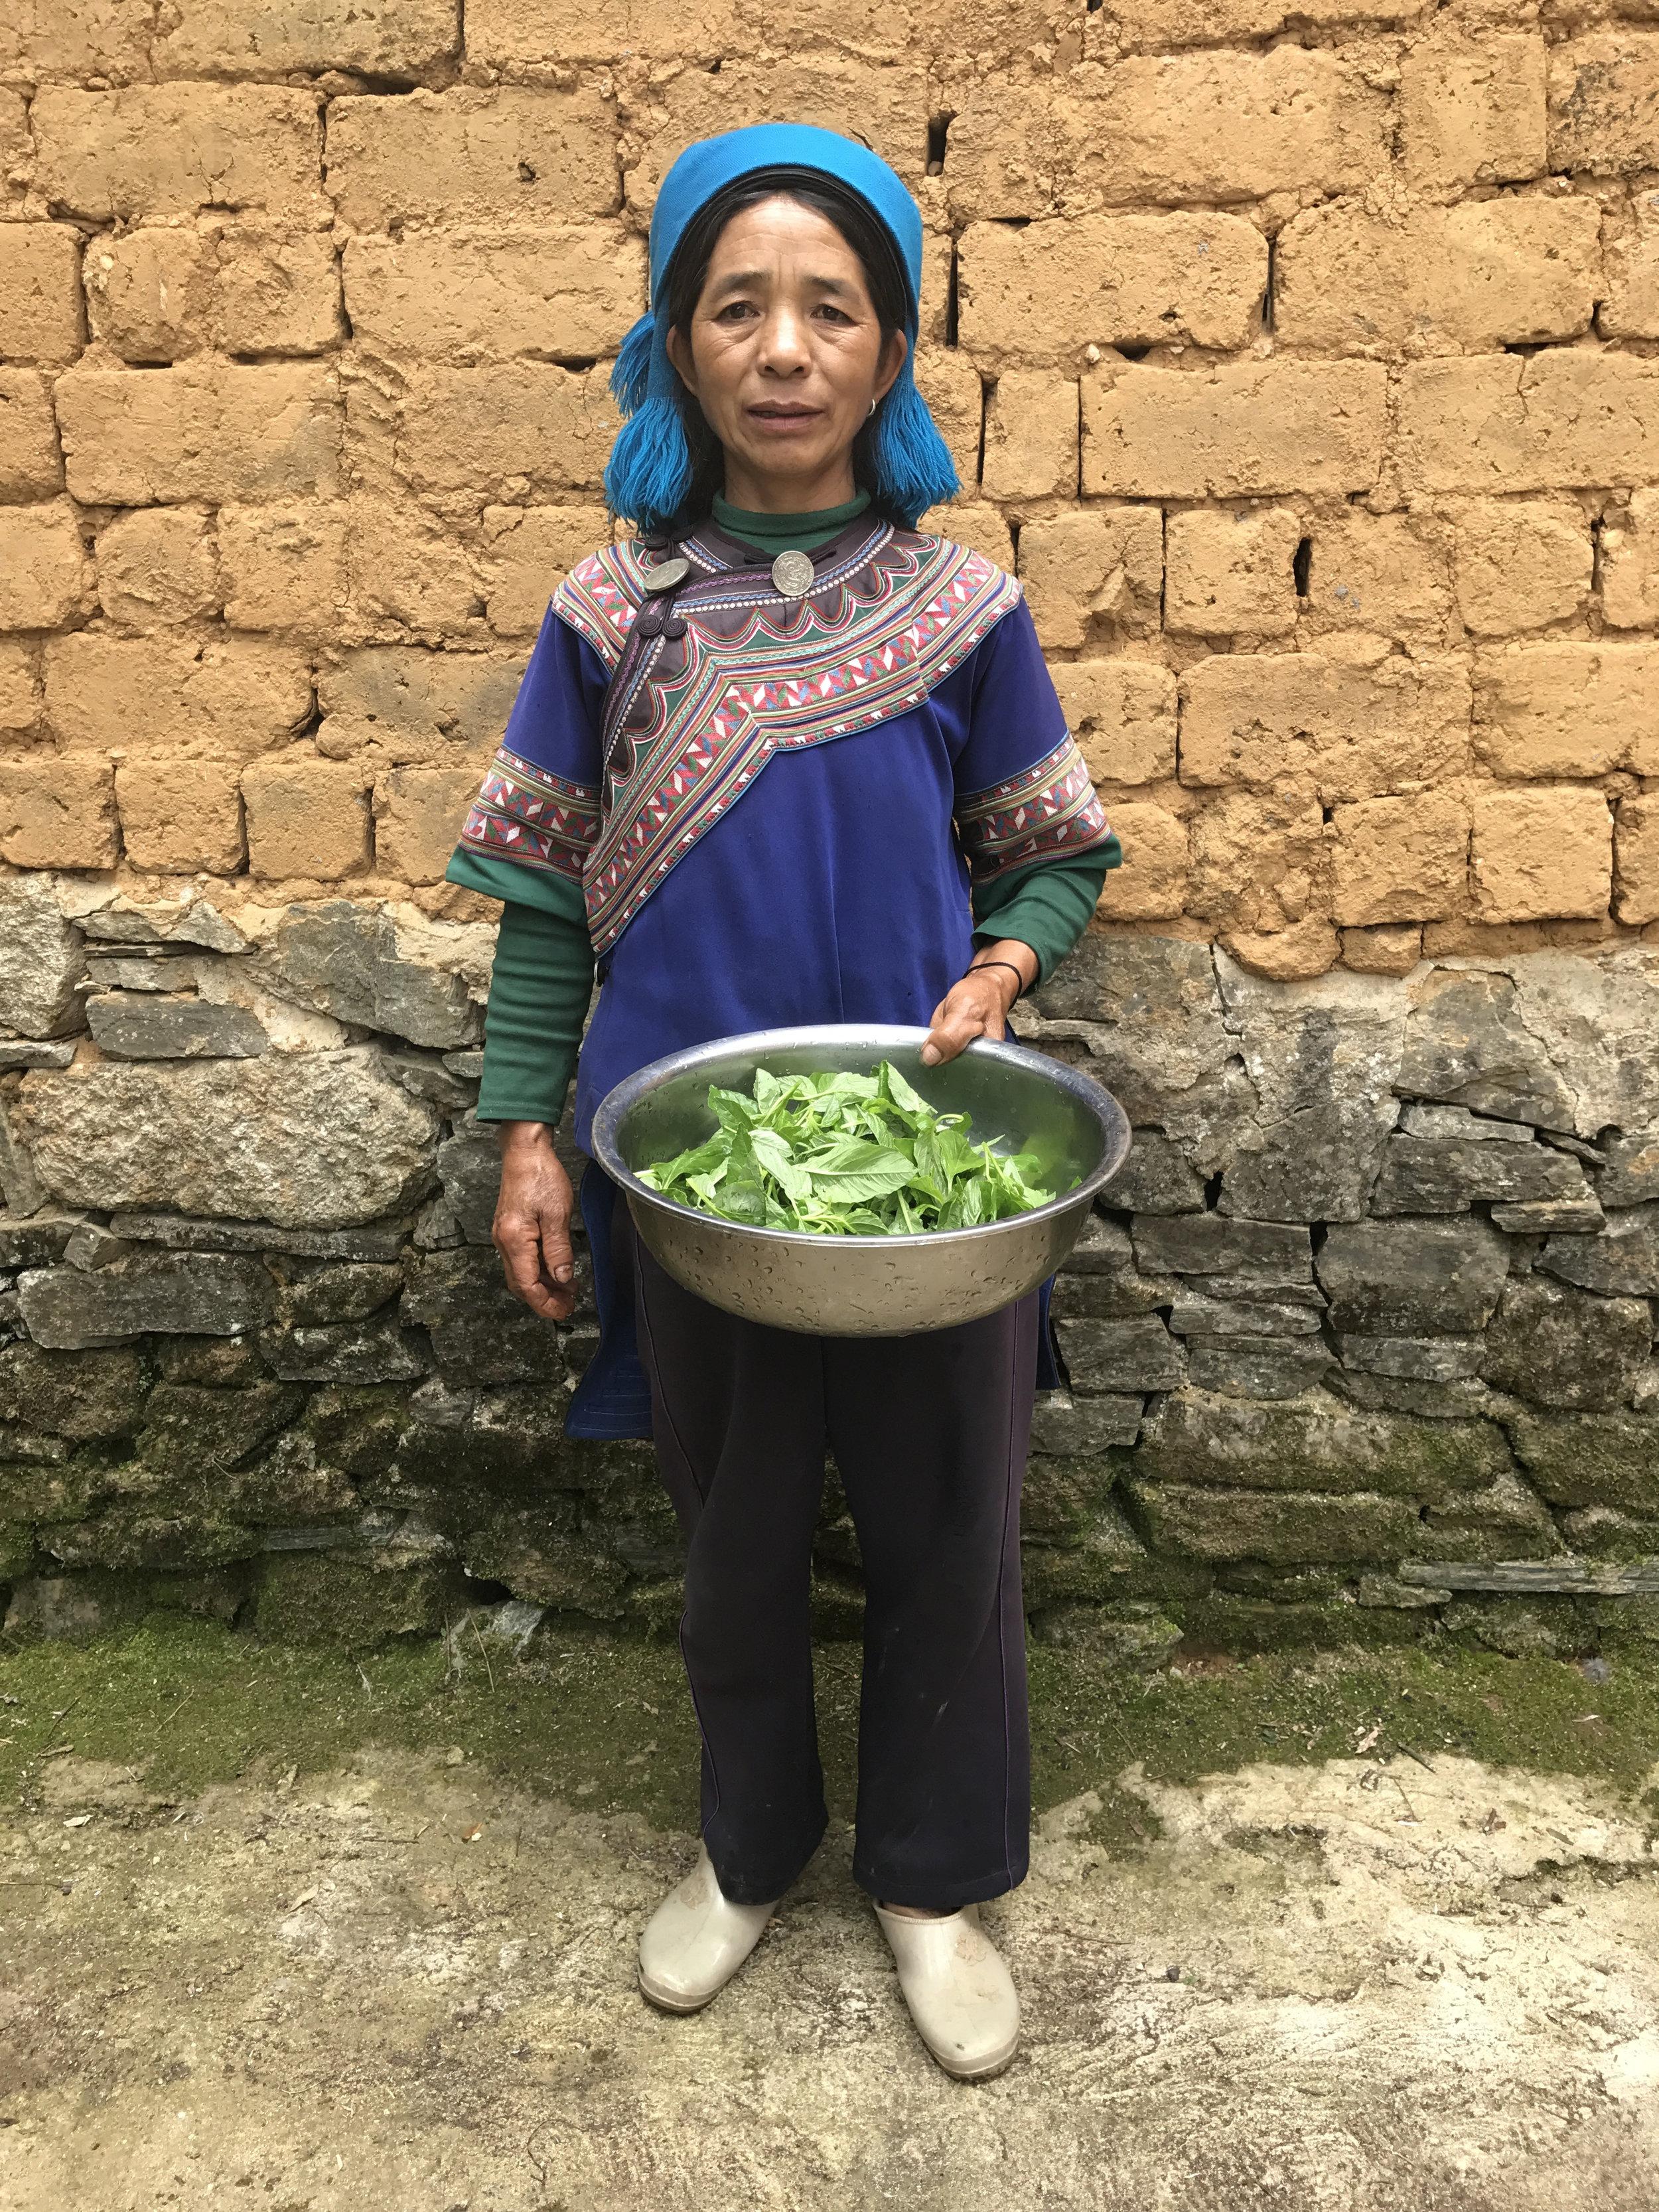 Hani woman preparing lunch, Luomo village, 2017.